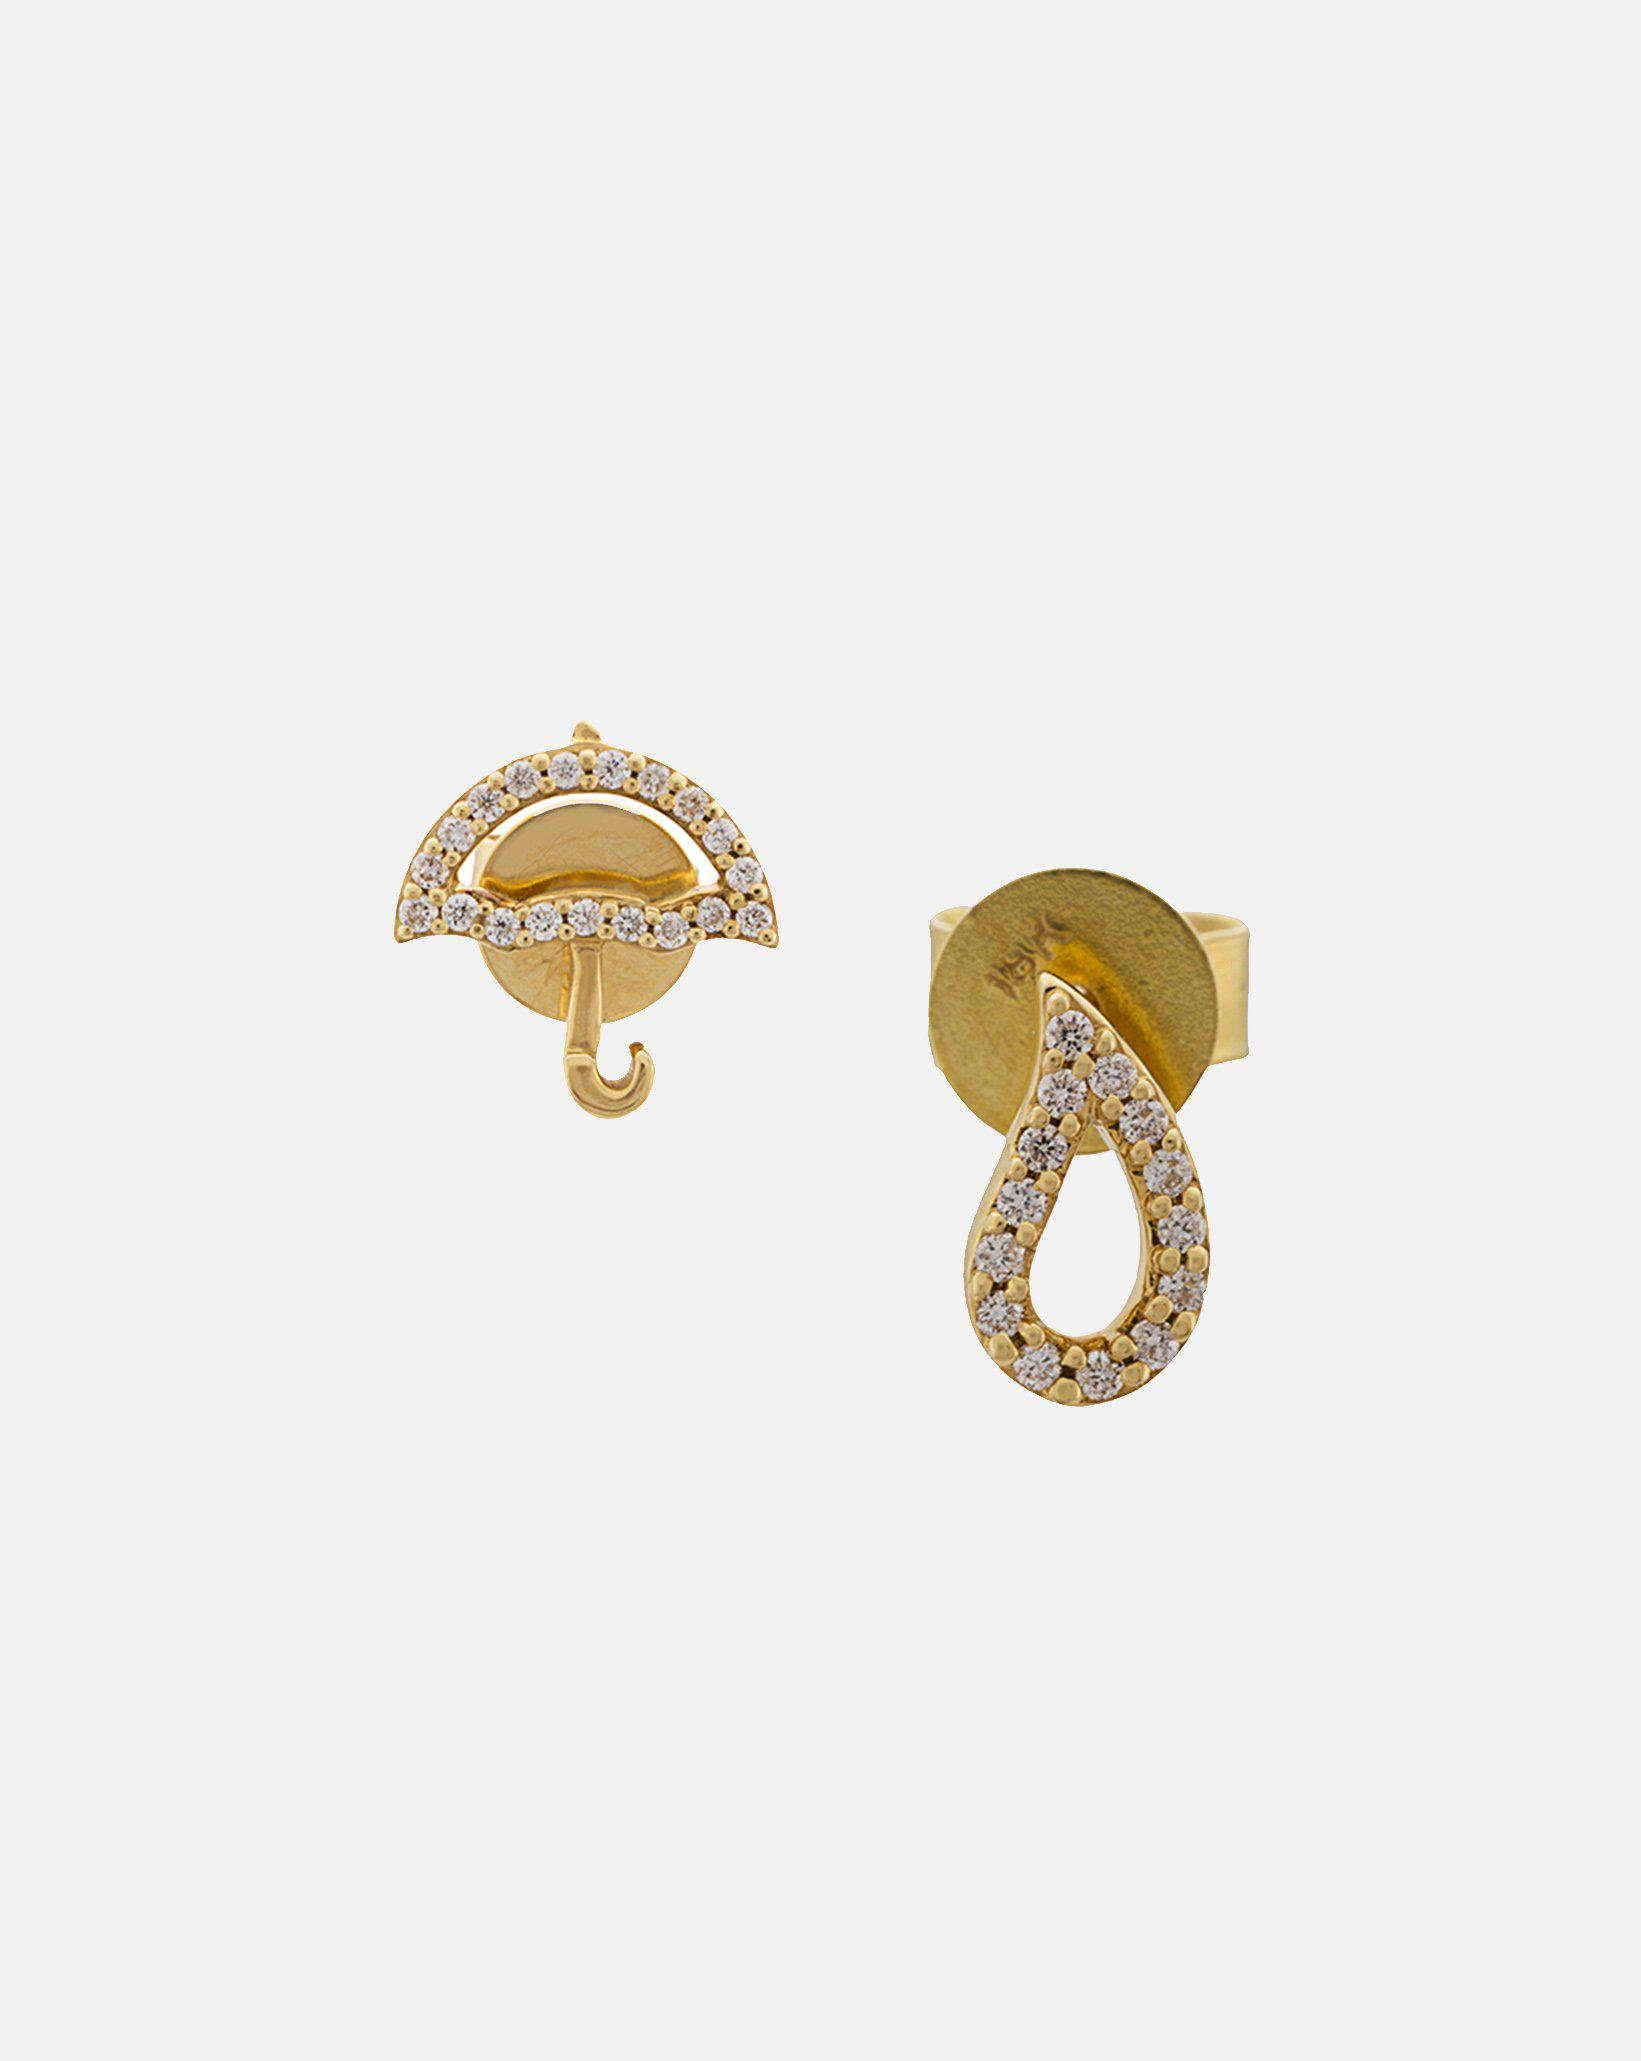 Khai Khai Cloud Stud earring Red Pre Order Eastbay Buy Cheap Nicekicks Free Shipping Pre Order 3YH1dXI9D